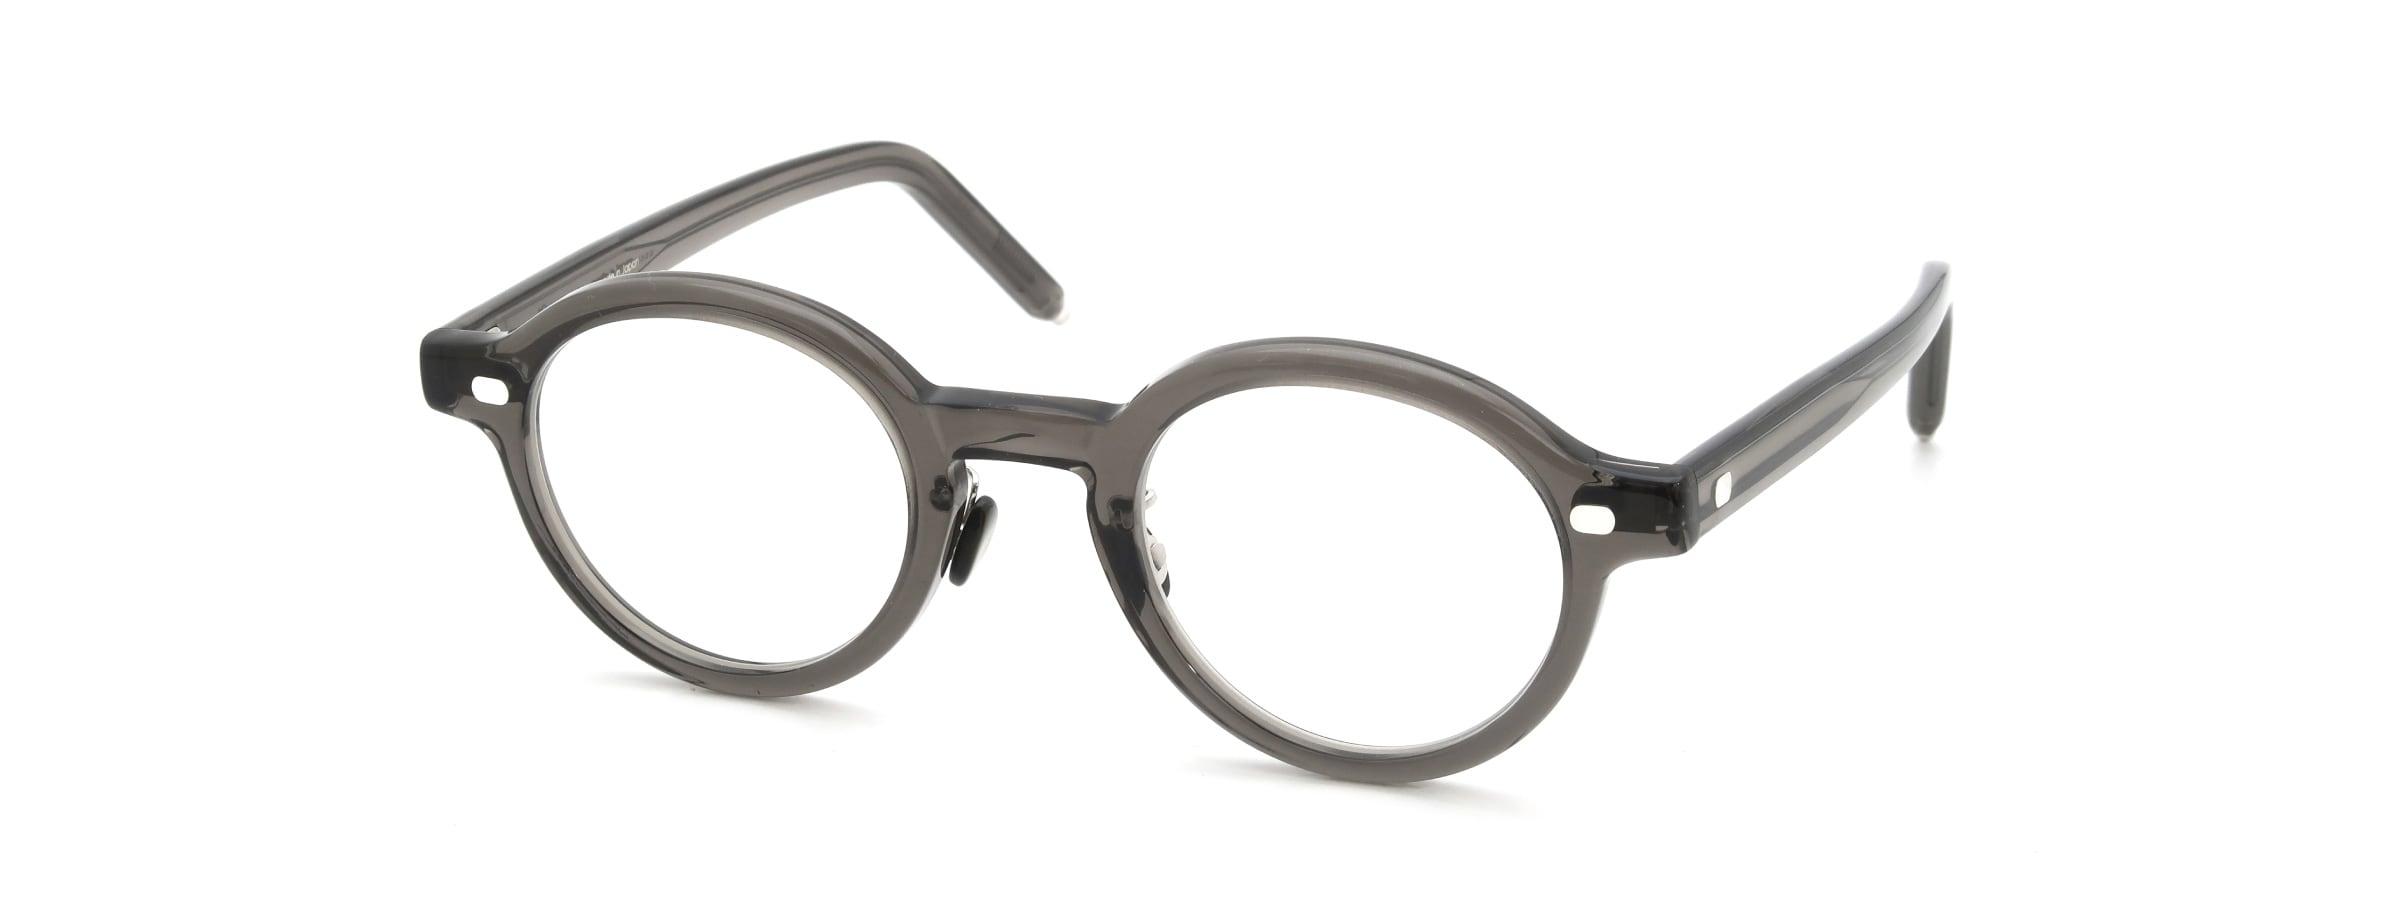 10 eyevan NO.5 Ⅲ FR 44size